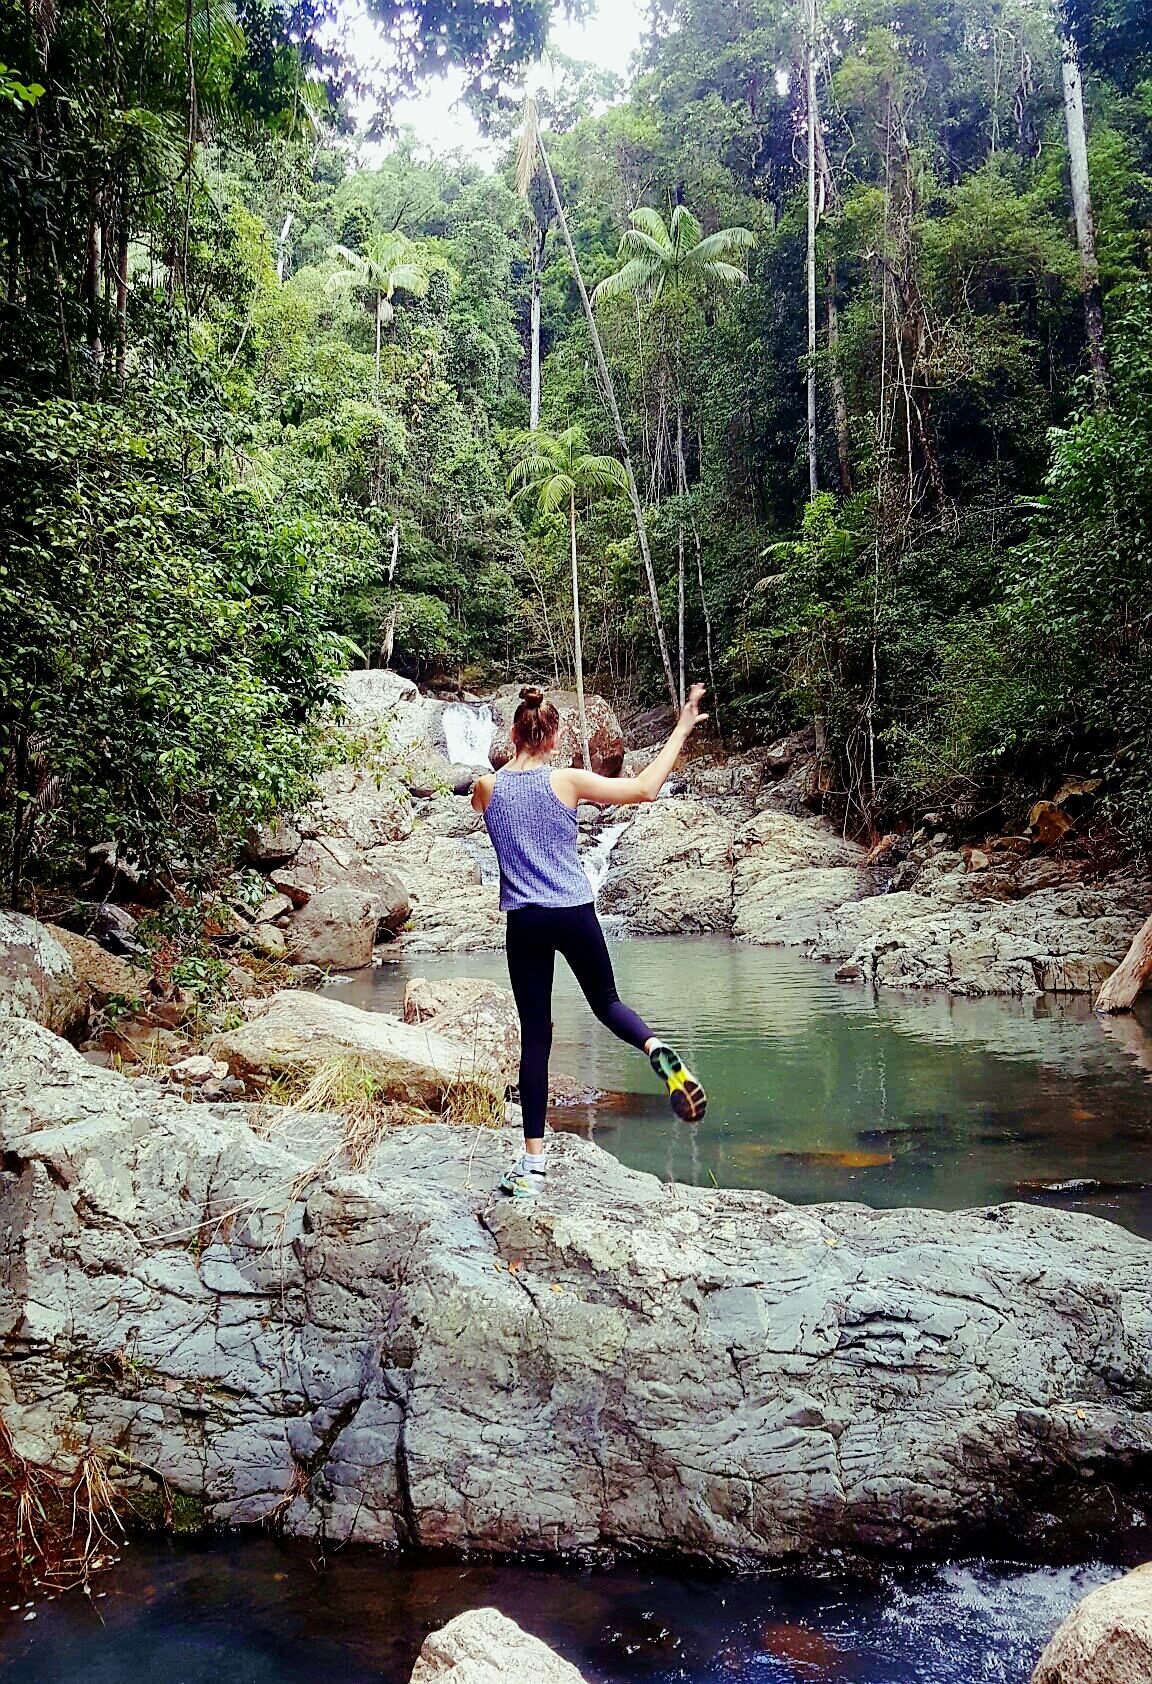 Hiking Guanaba Creek by Jim Noort